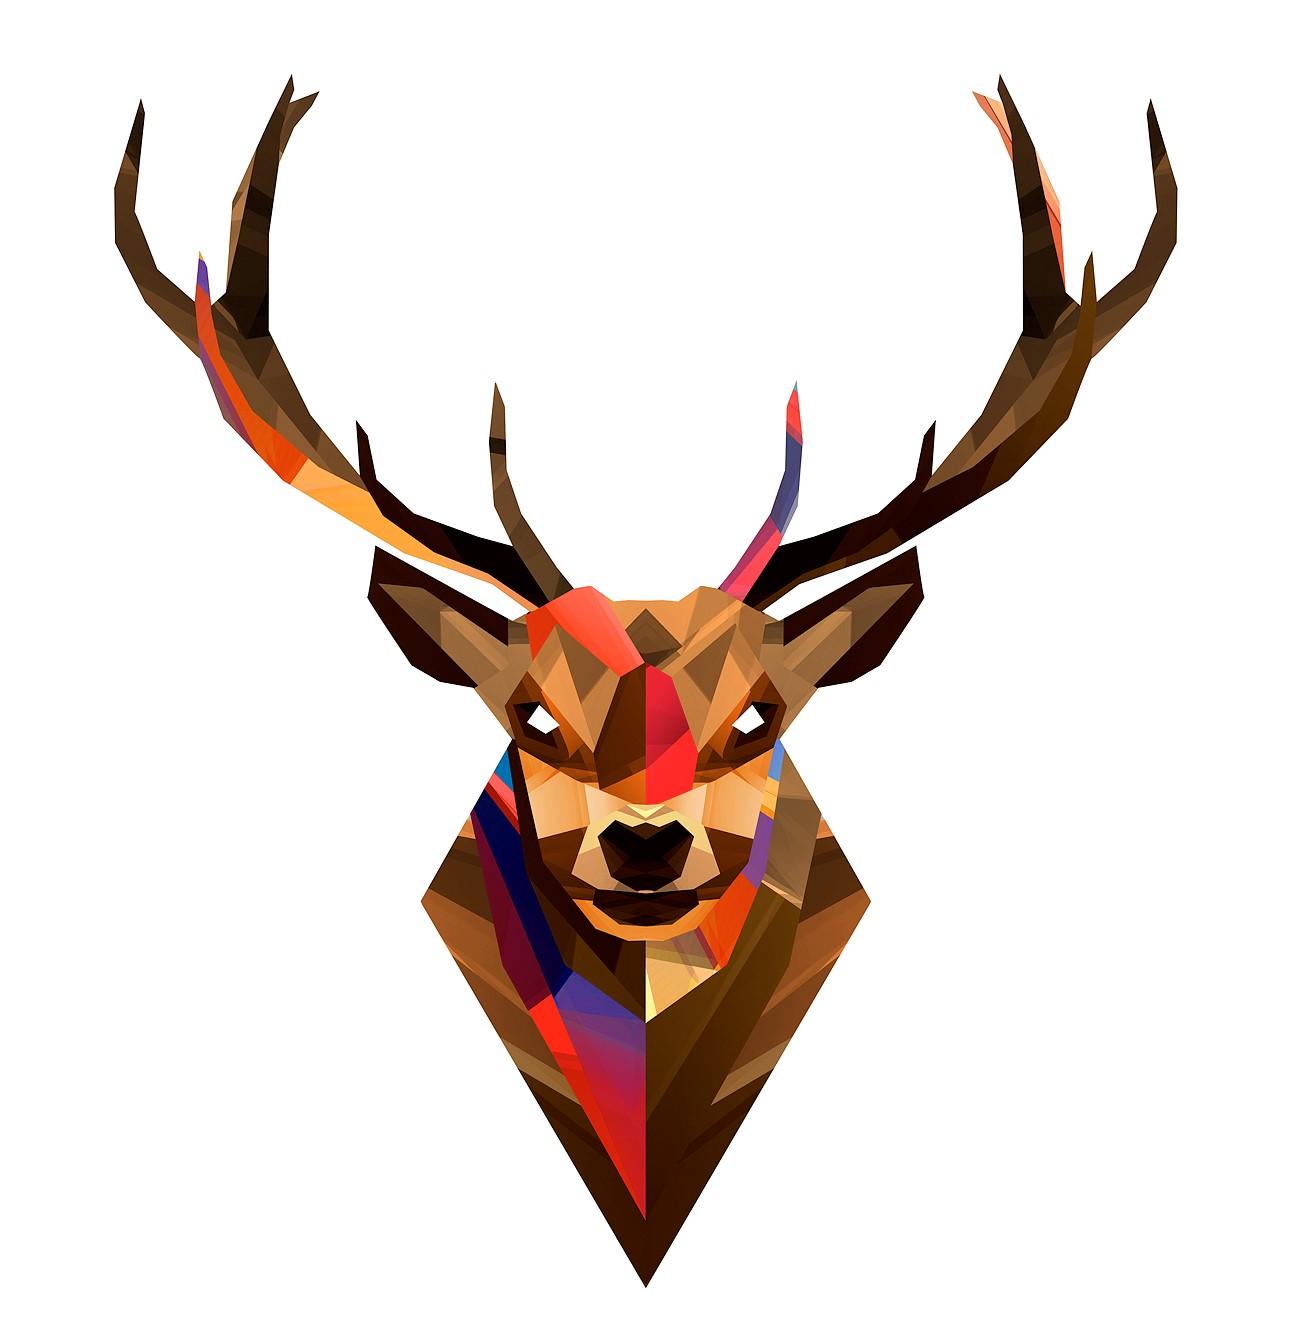 ekwisnek's avatar